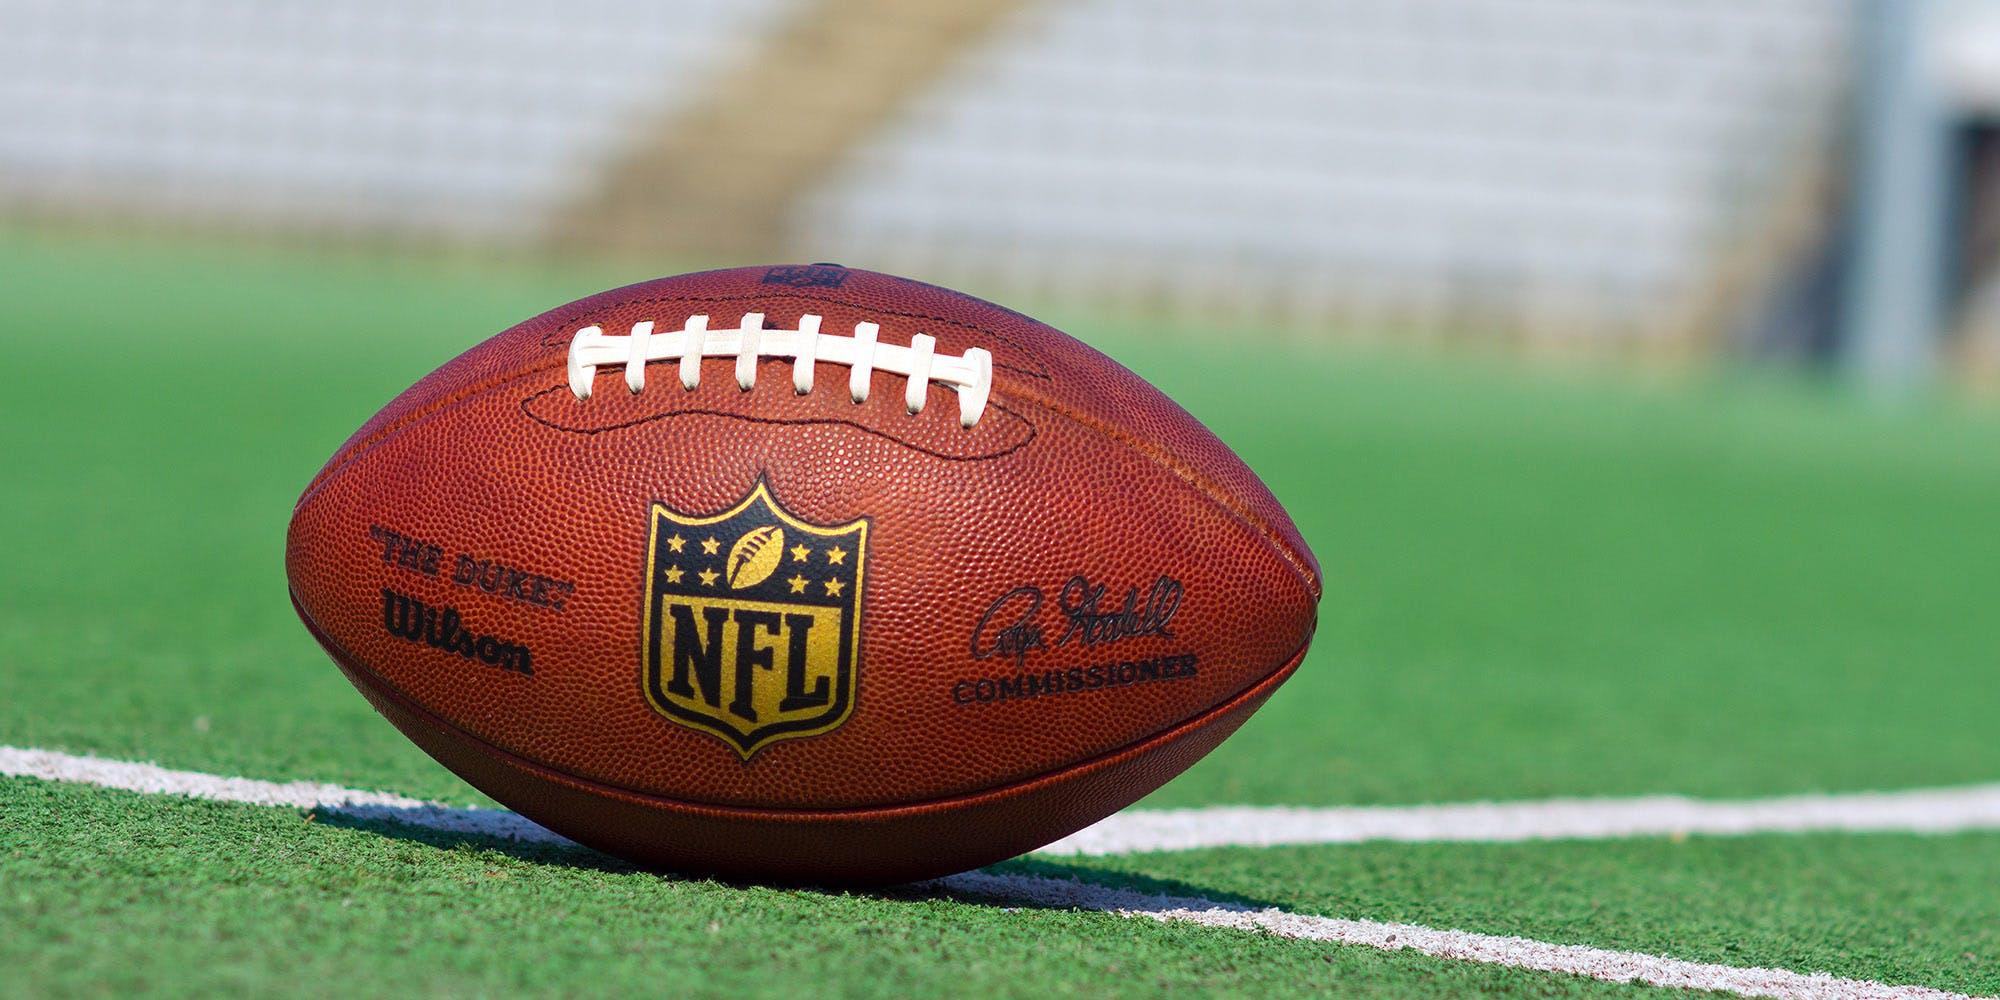 NFL football stream nfl games live